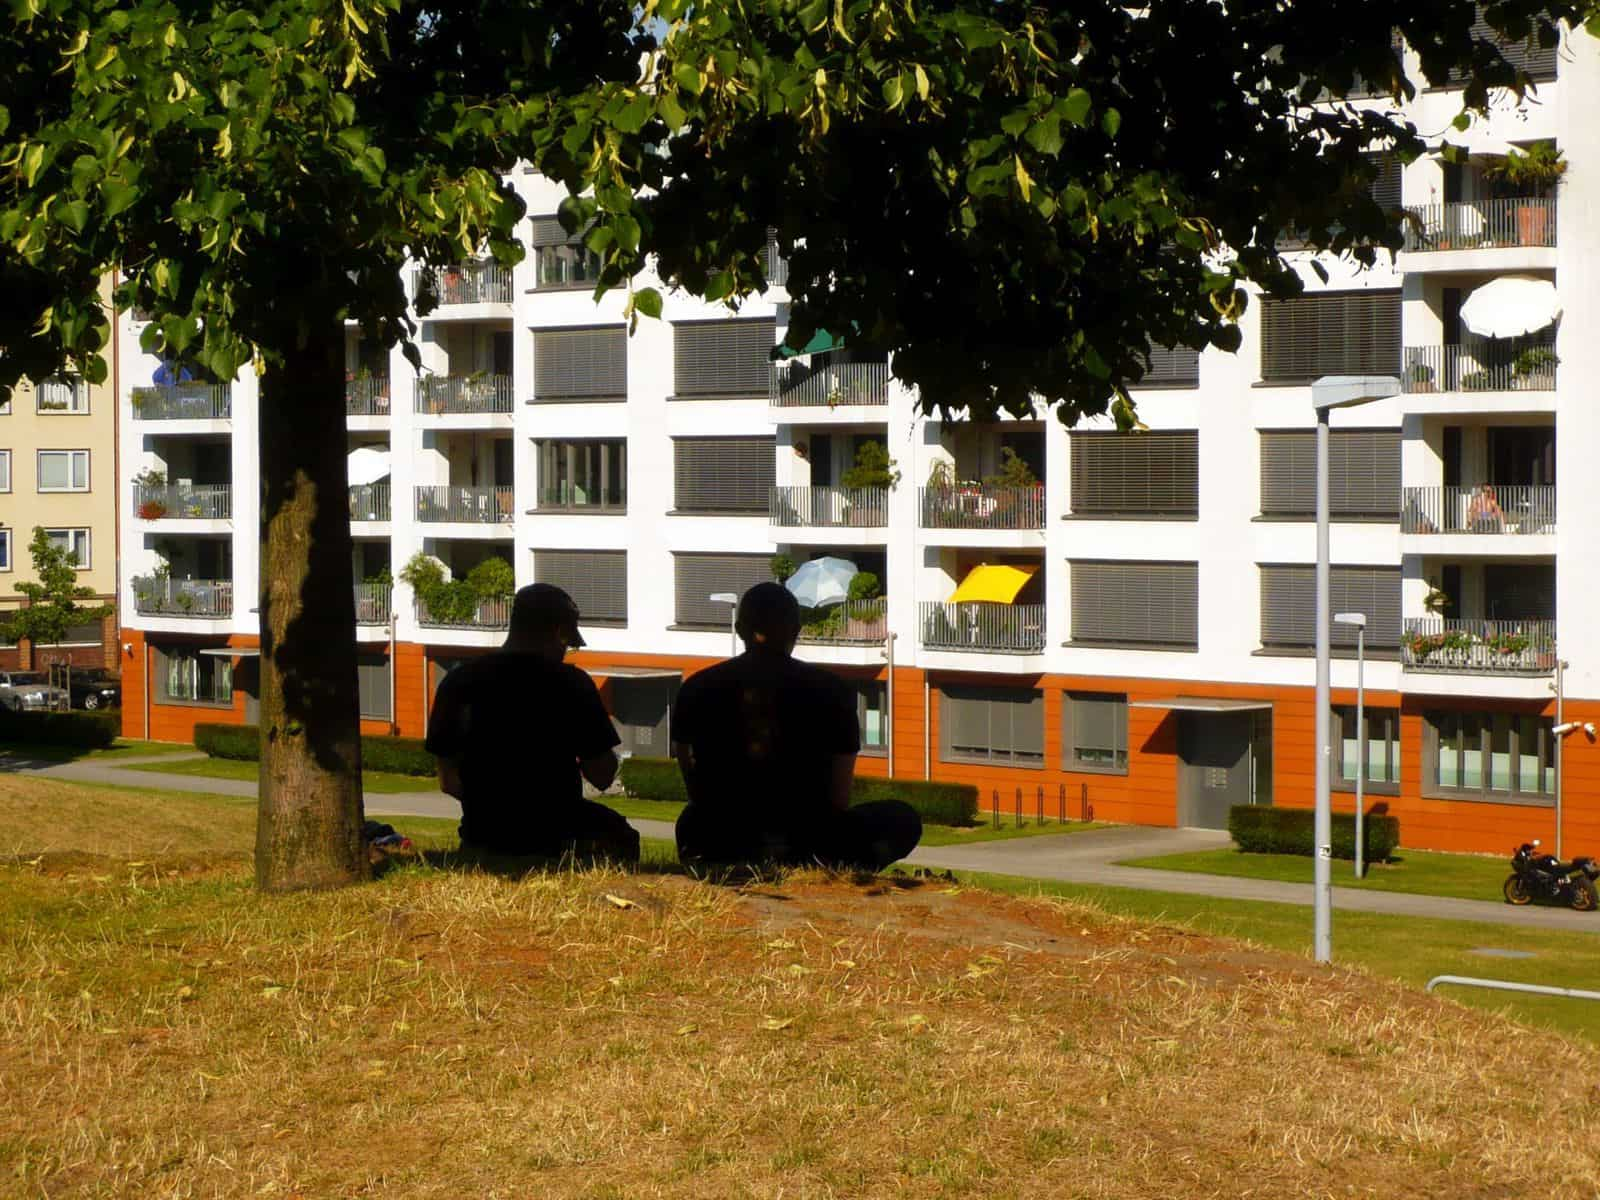 BdW21: Im Bürgerpark